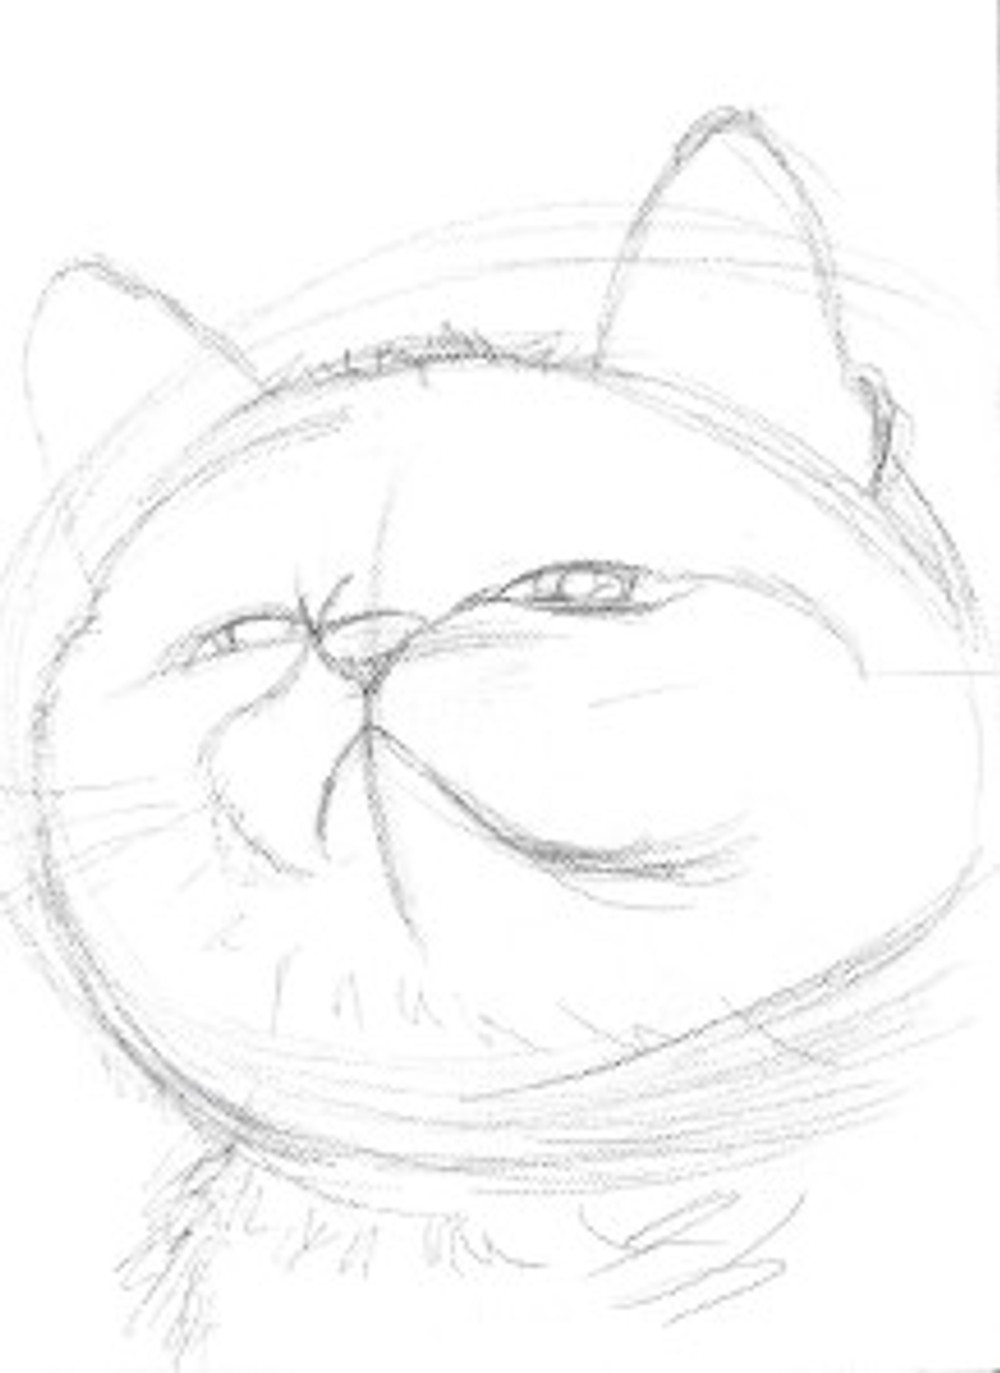 Artwork sketch